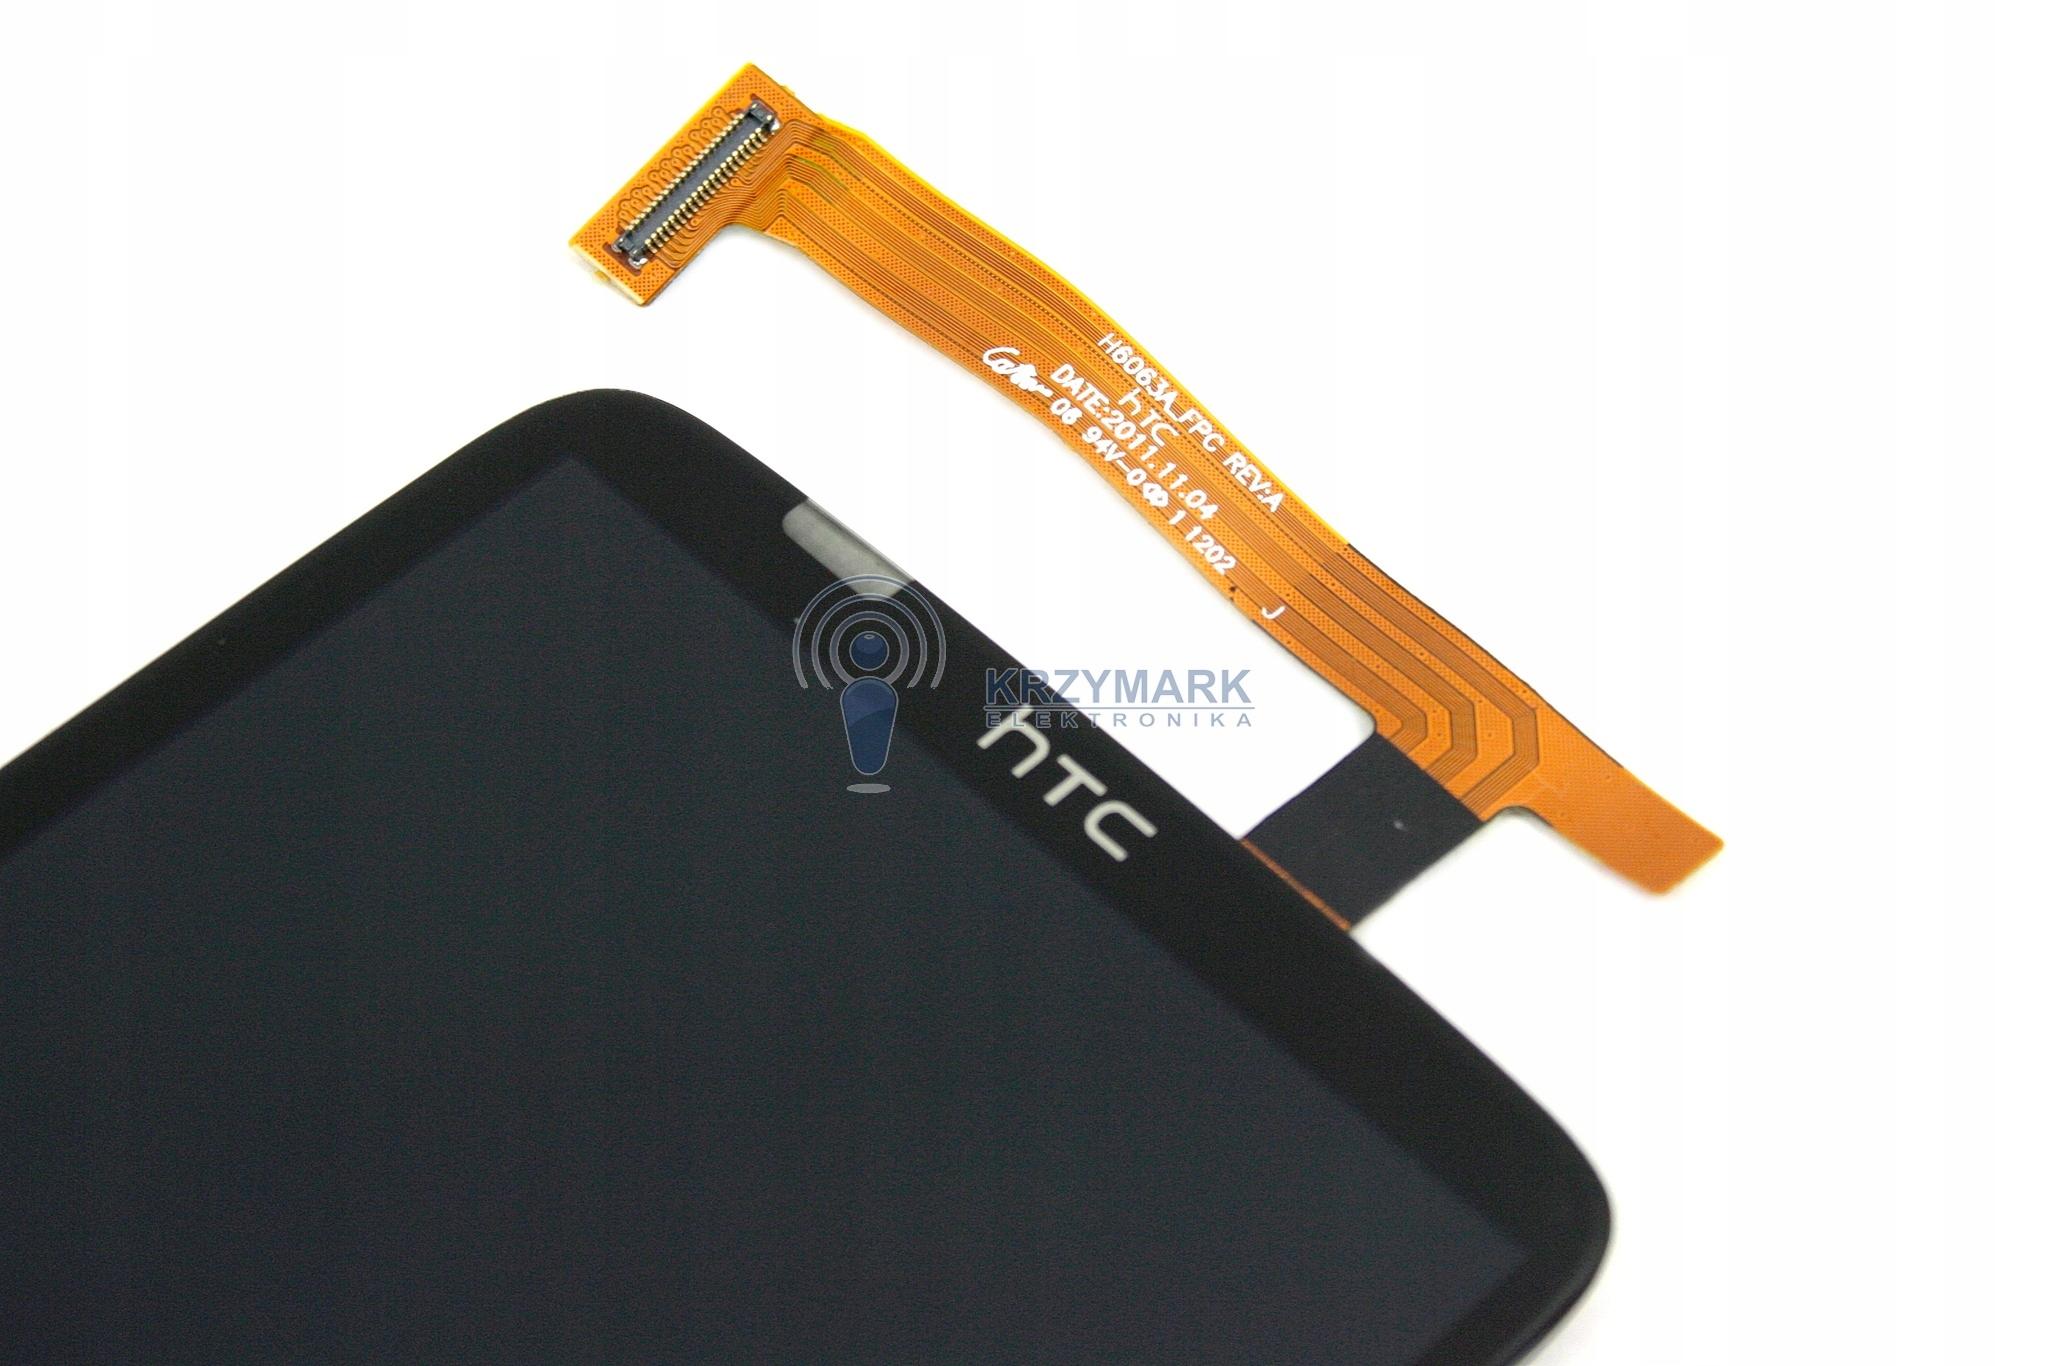 DOTYK SZYBKA DIGITIZER HTC ONE X S720E LCD EKRAN